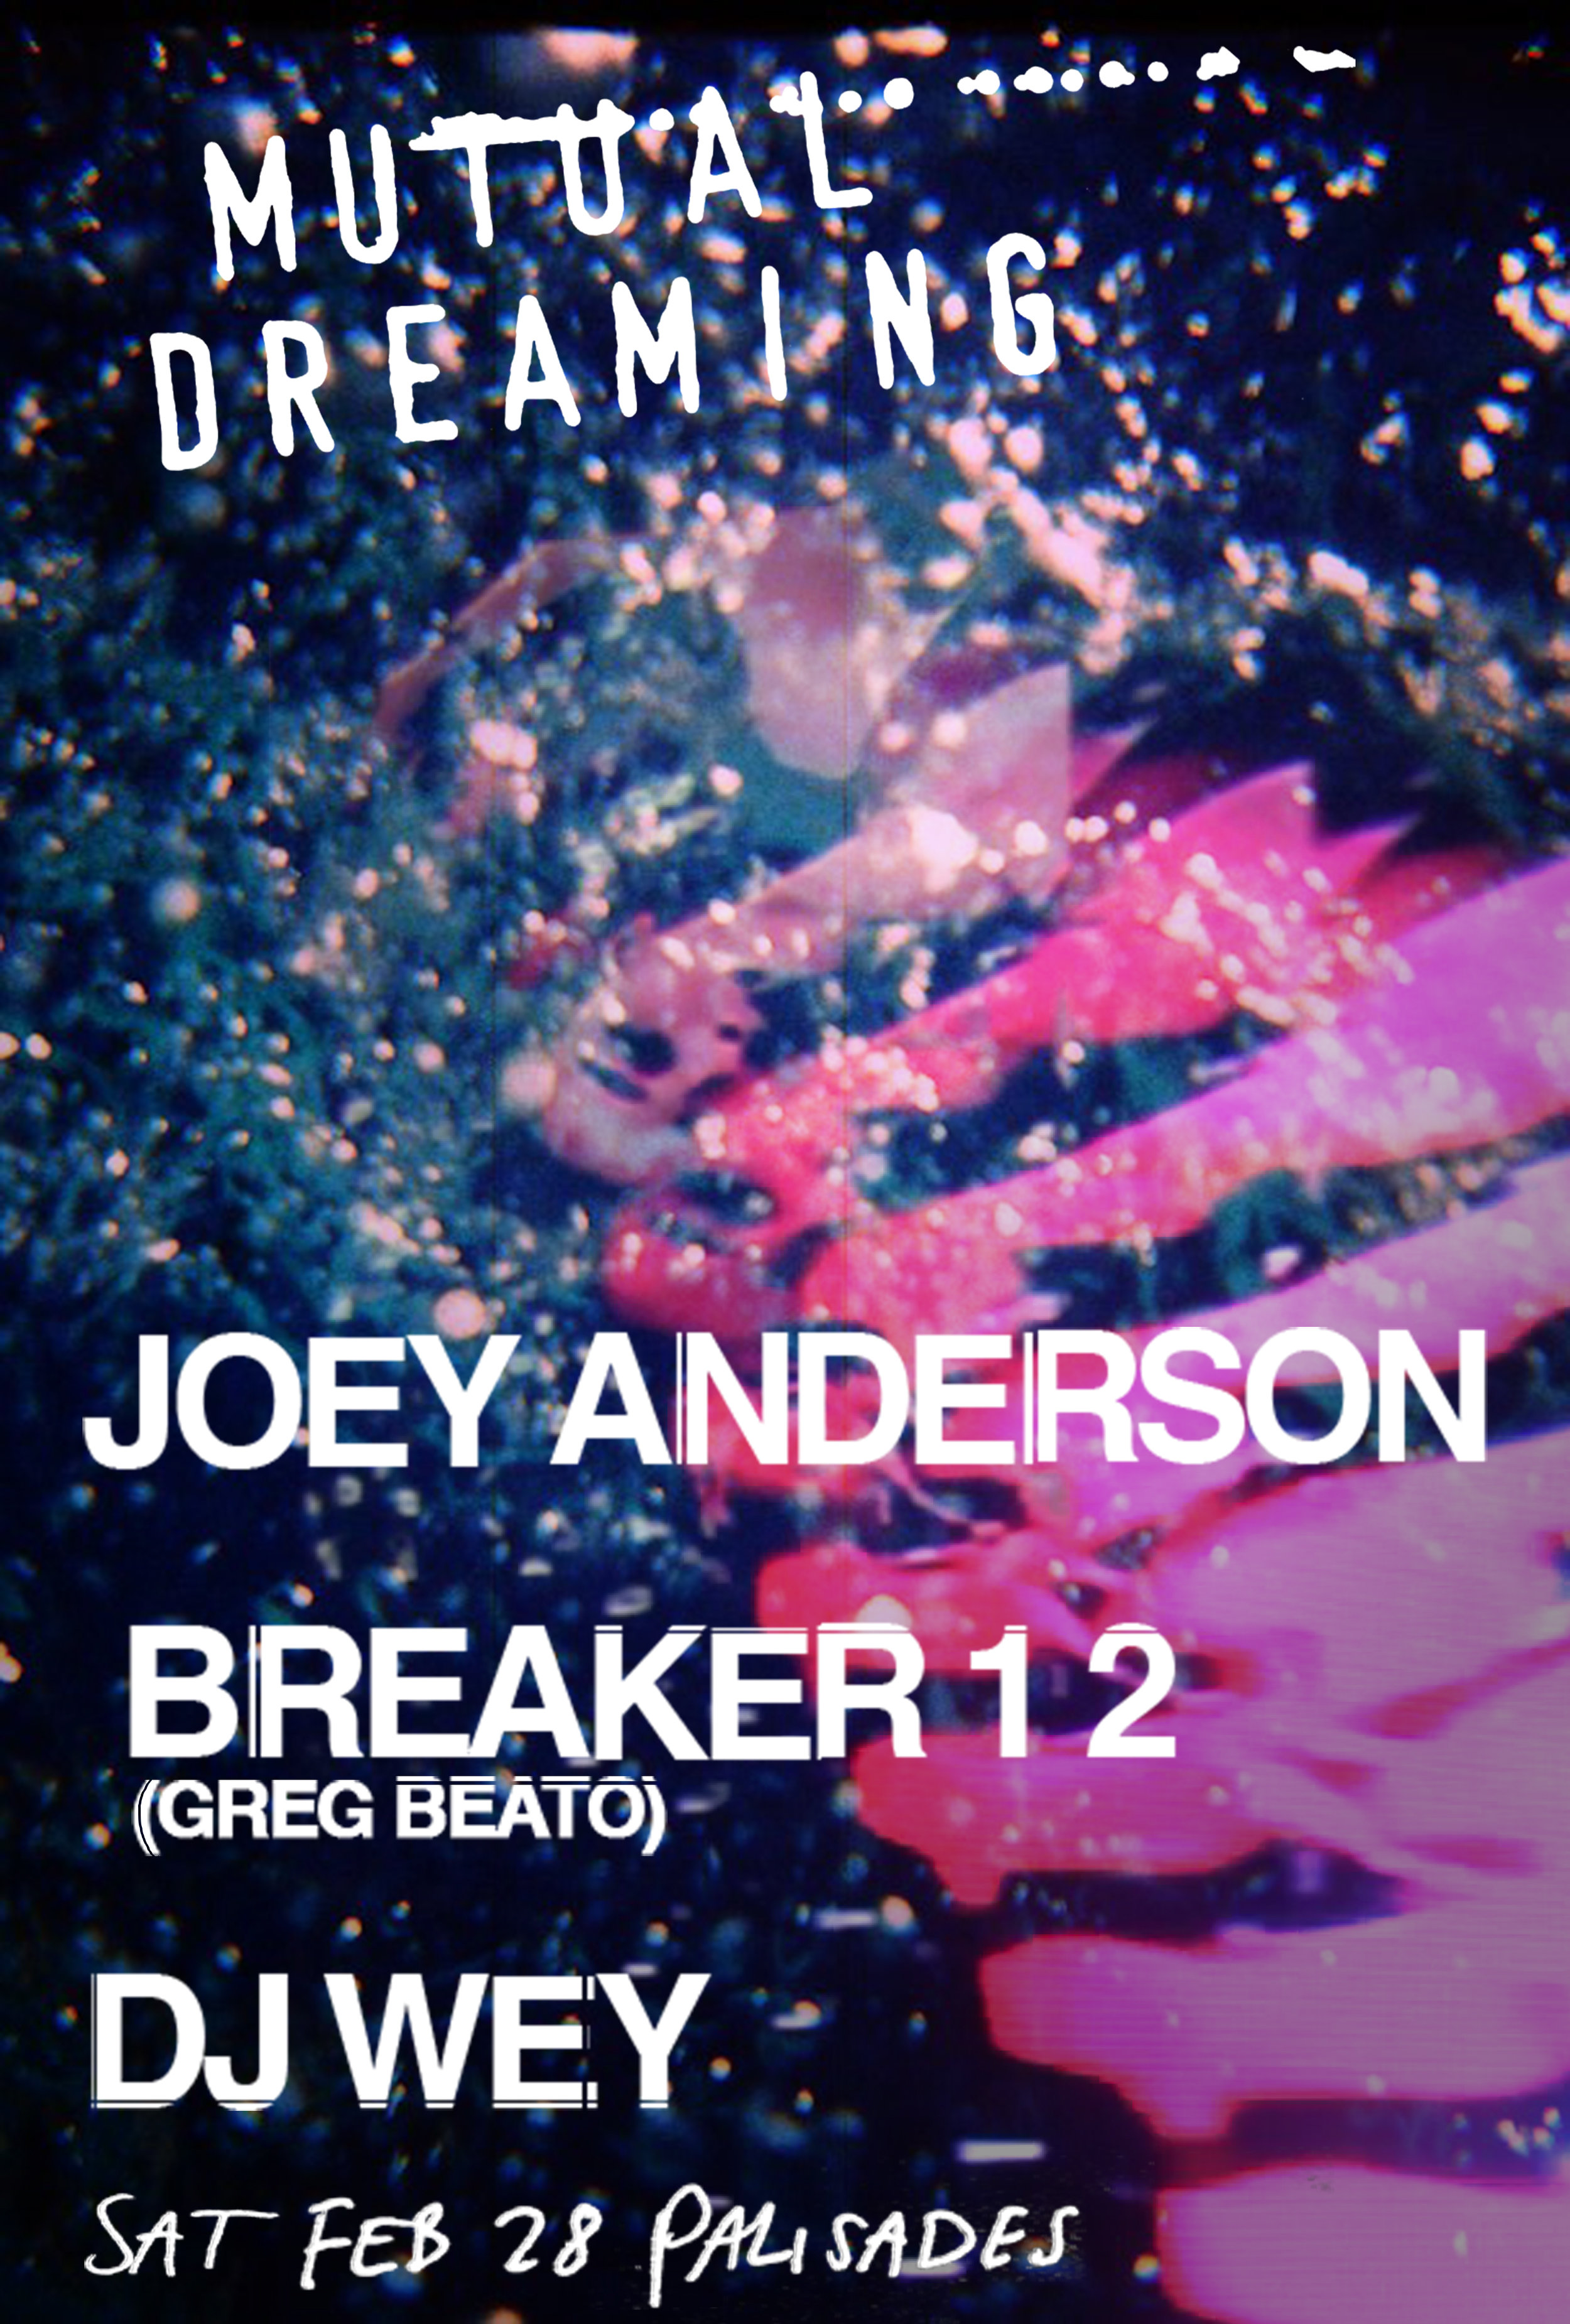 Mutual Dreaming: Joey Anderson, Breaker 1 2 (Greg Beato), DJ Wey  February 2015